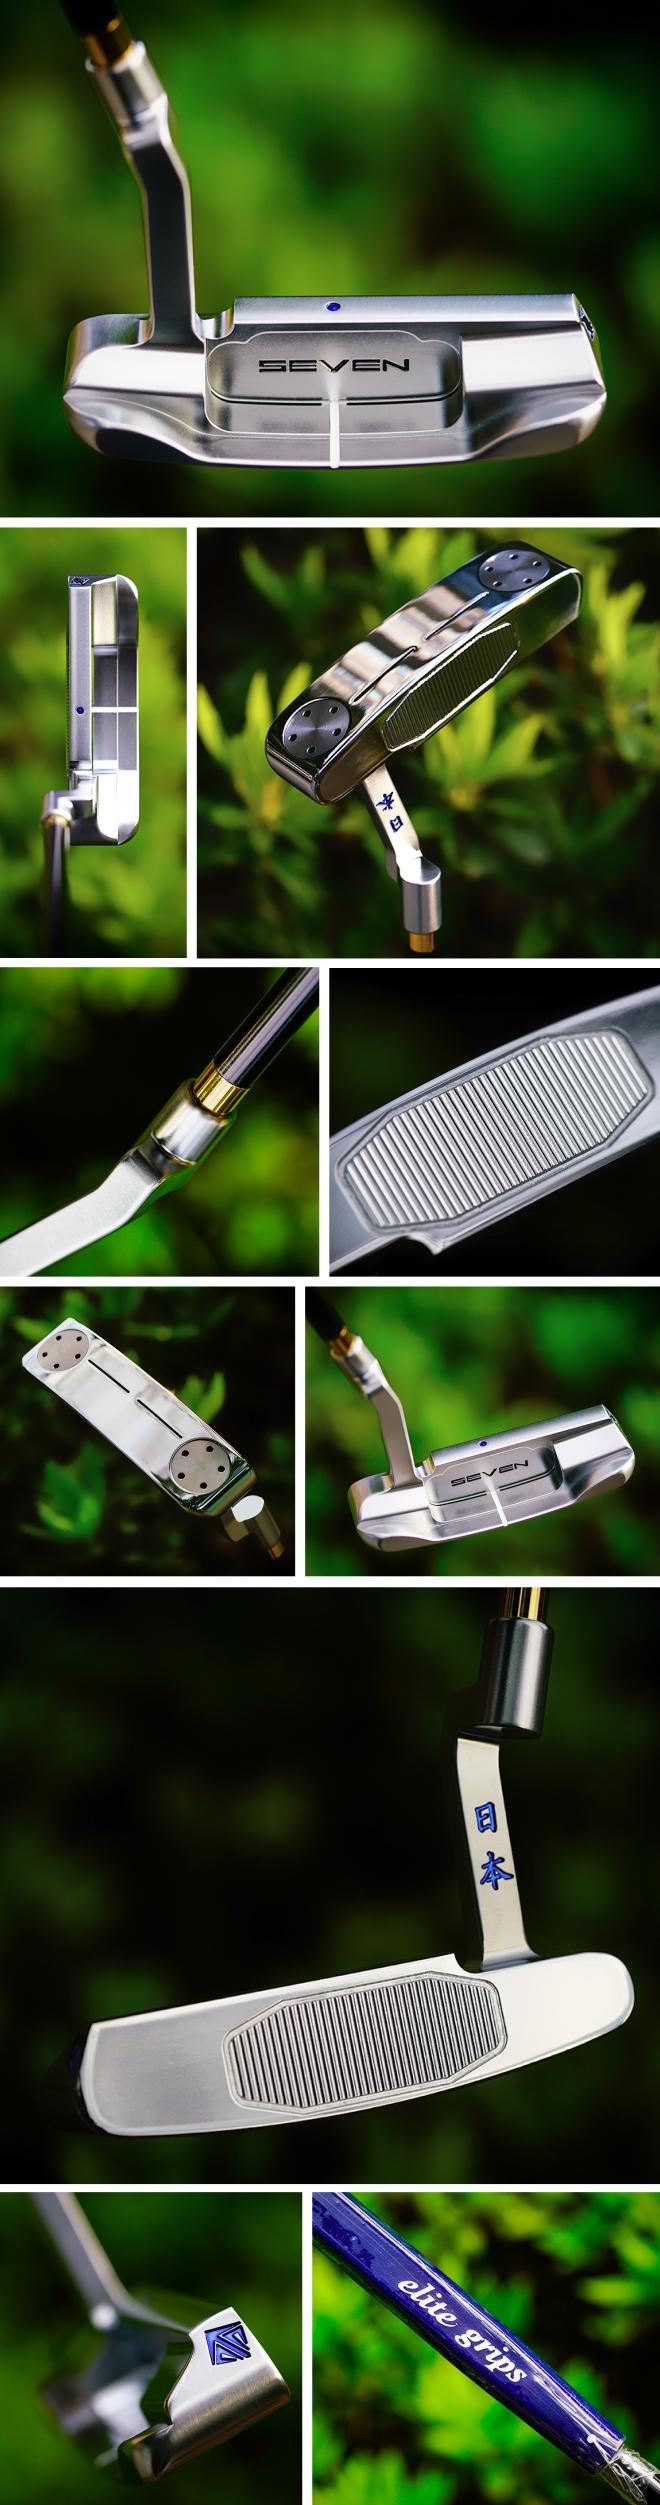 Seven X Golds Factory Dual Slit Putter